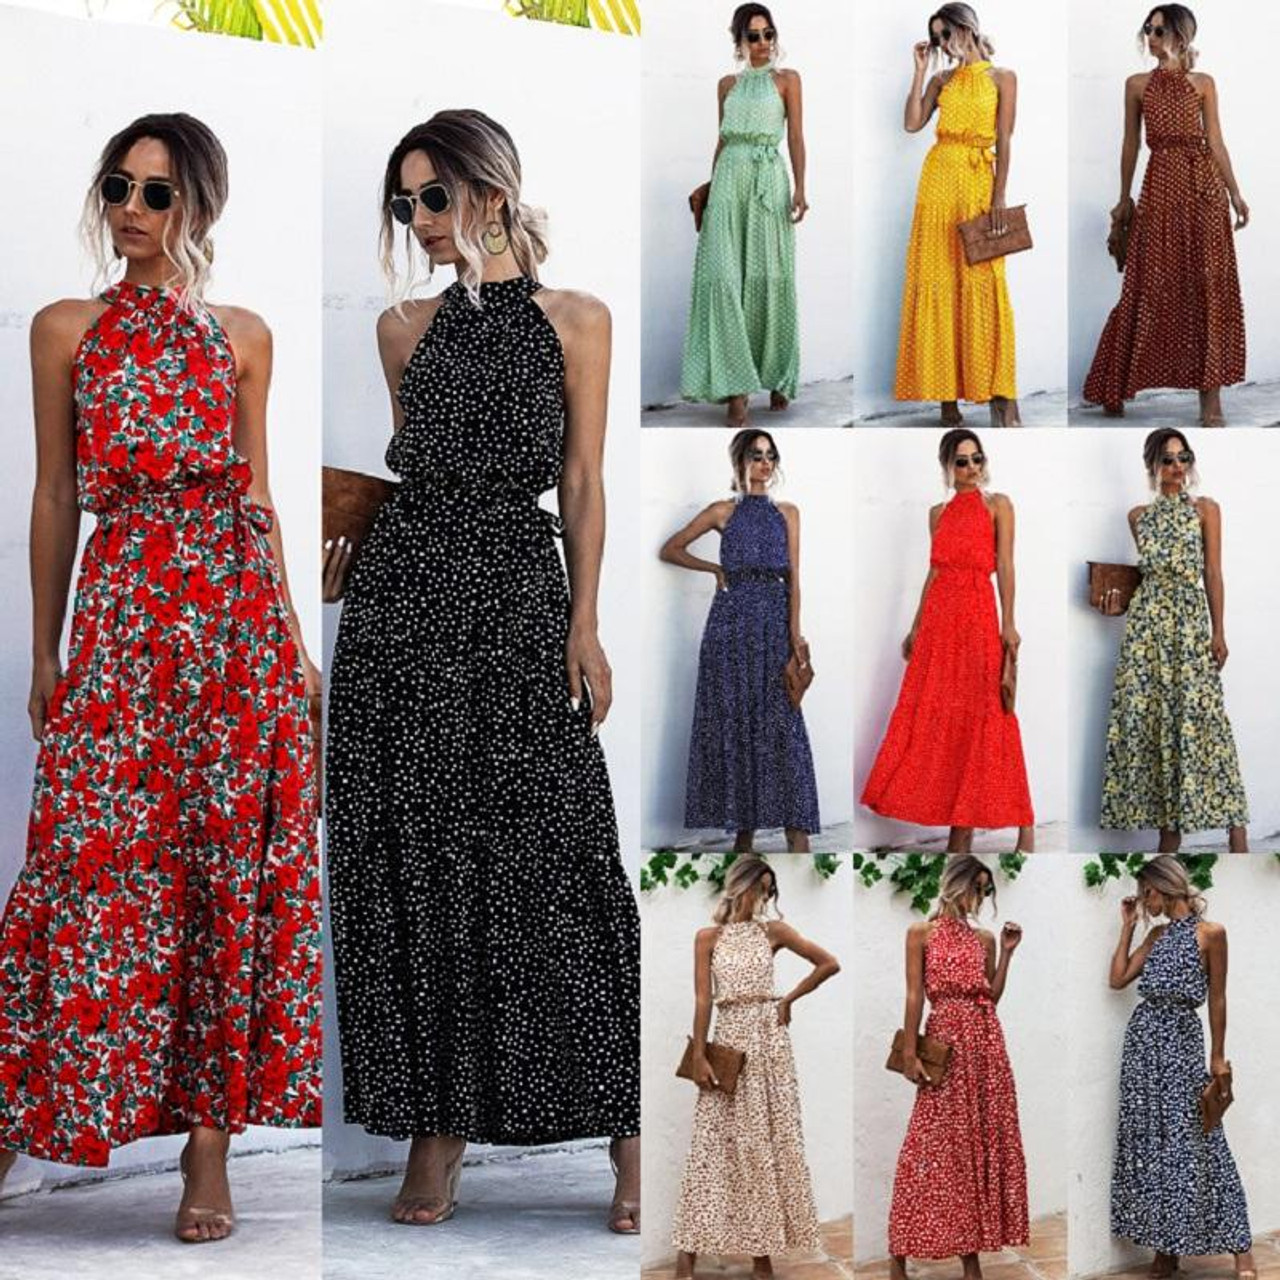 Summer Elegant Sexy beach long Dress Women 6 Fashion Print Flowers  Polka-dot strap Ladies Halter boho dress women vestidos